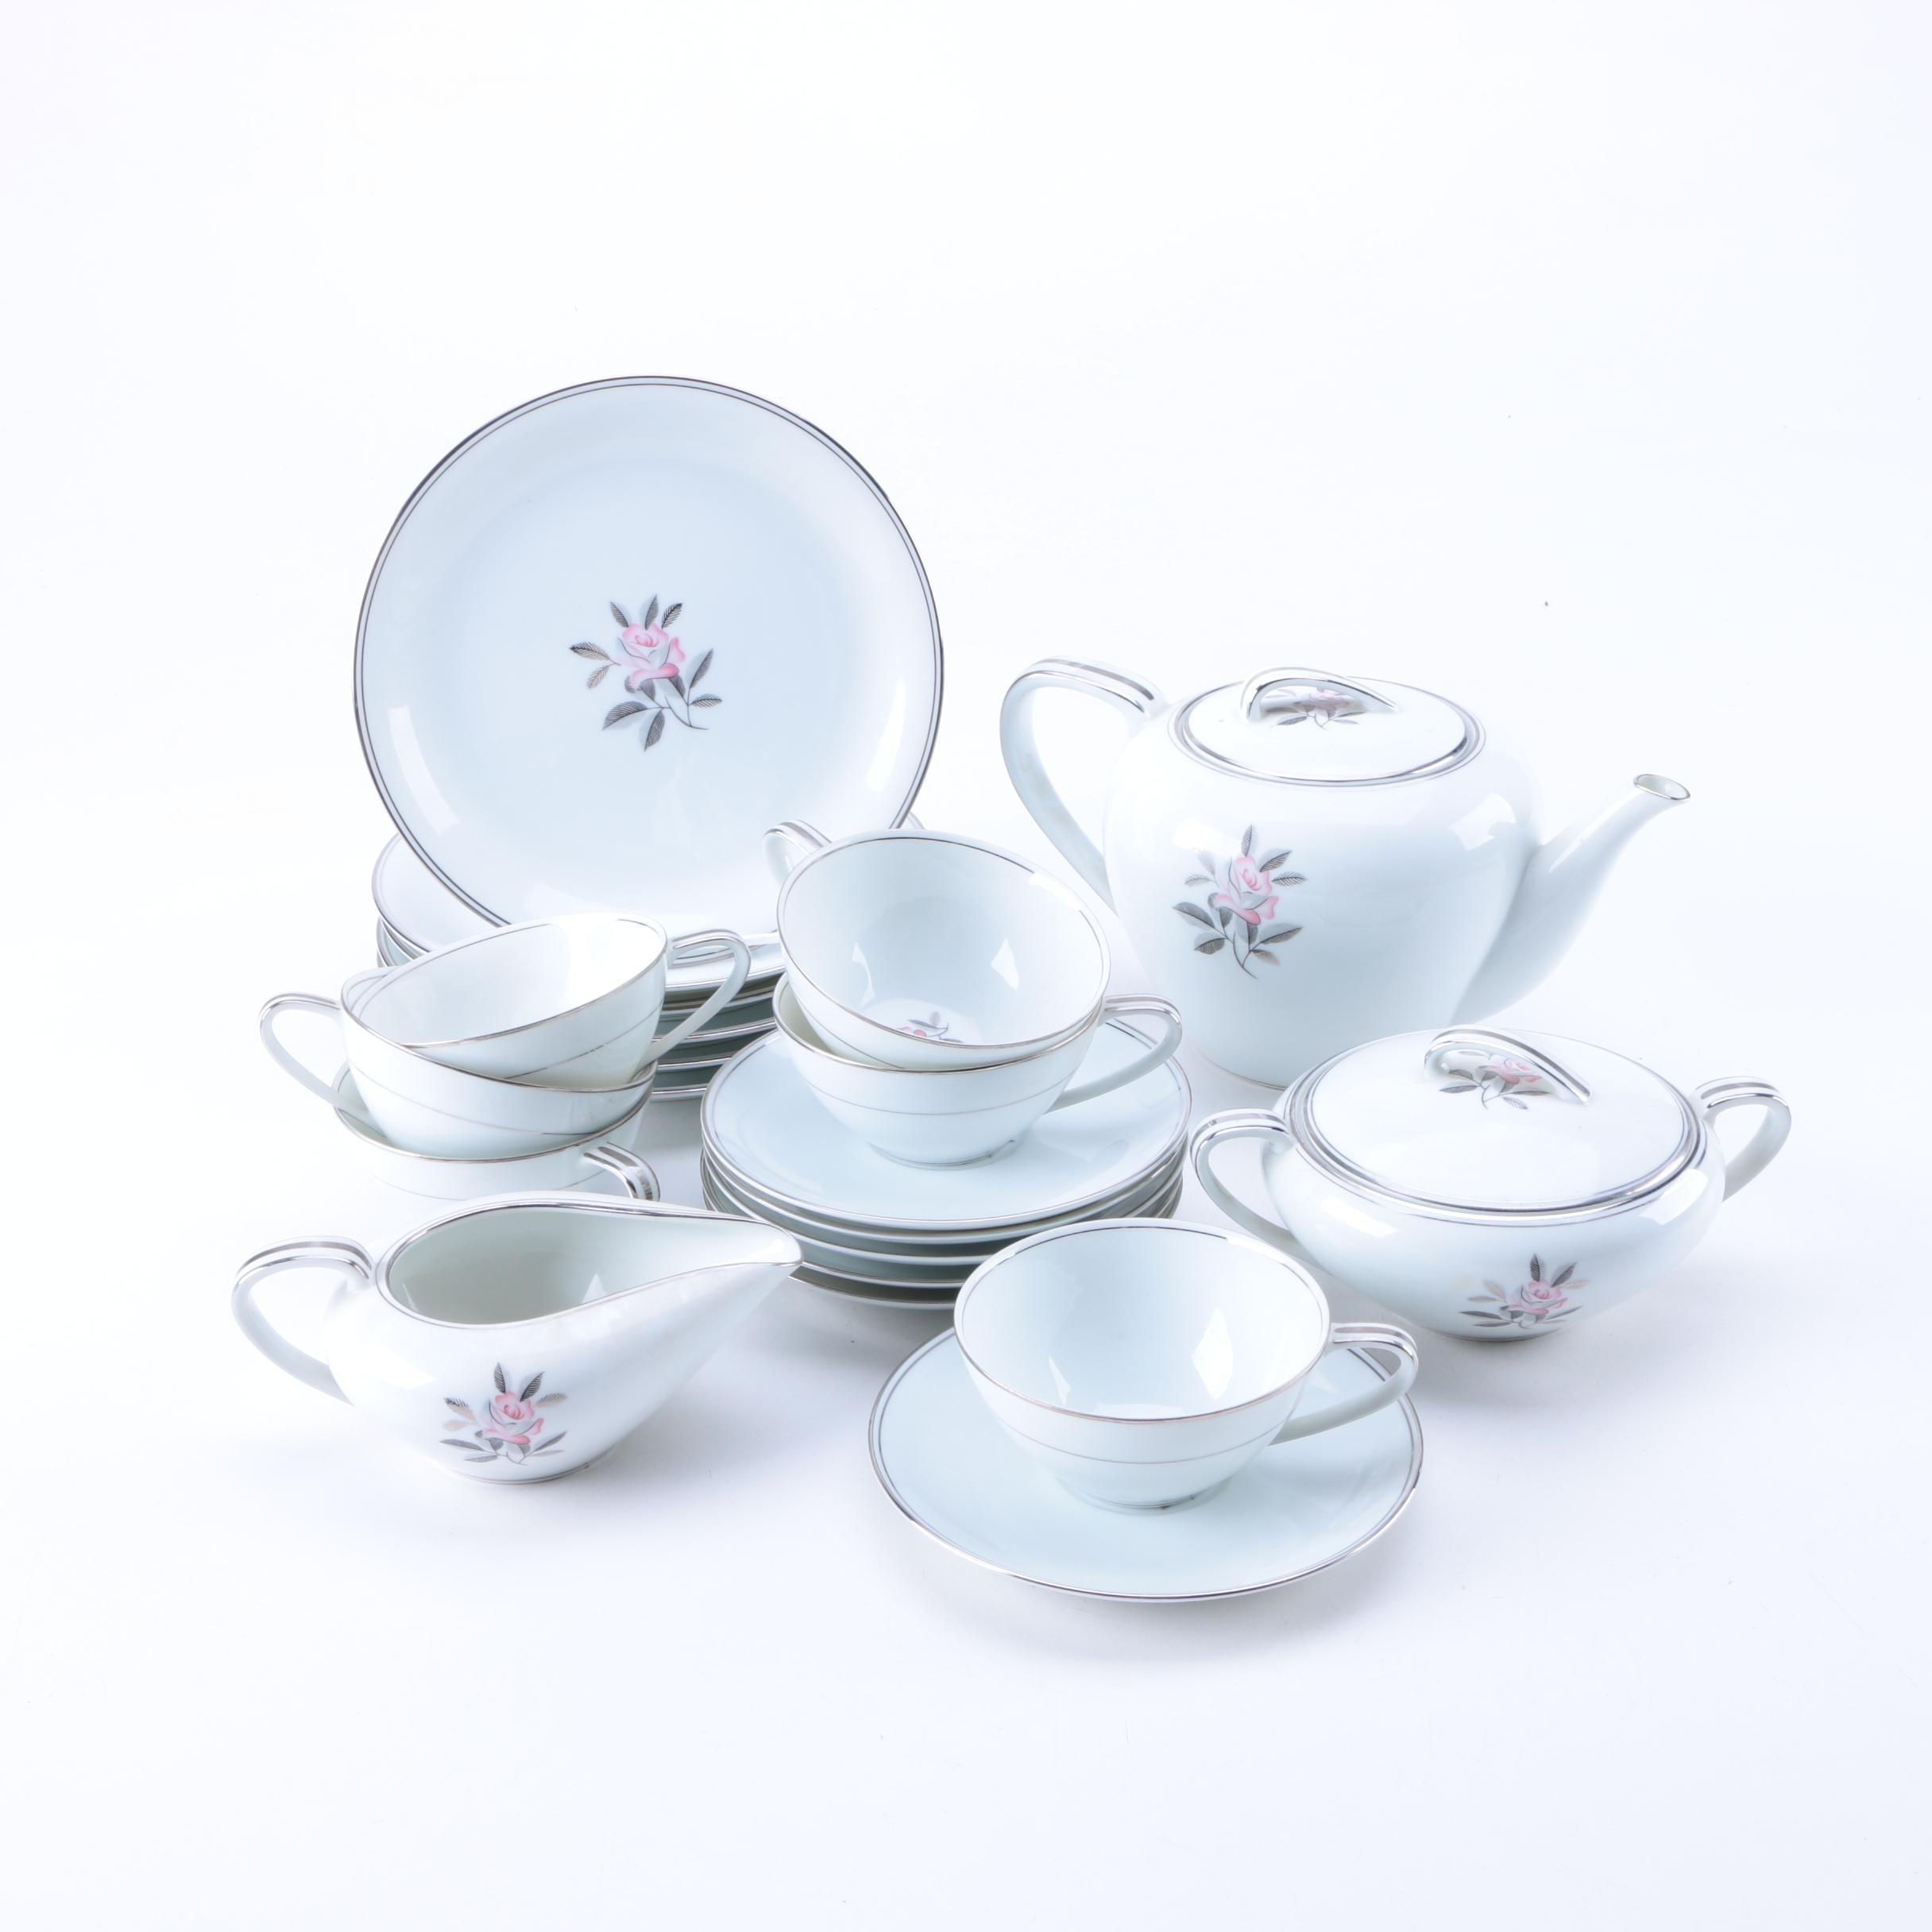 Set of Noritake  Rosales  Porcelain Tableware ...  sc 1 st  EBTH.com & Set of Noritake